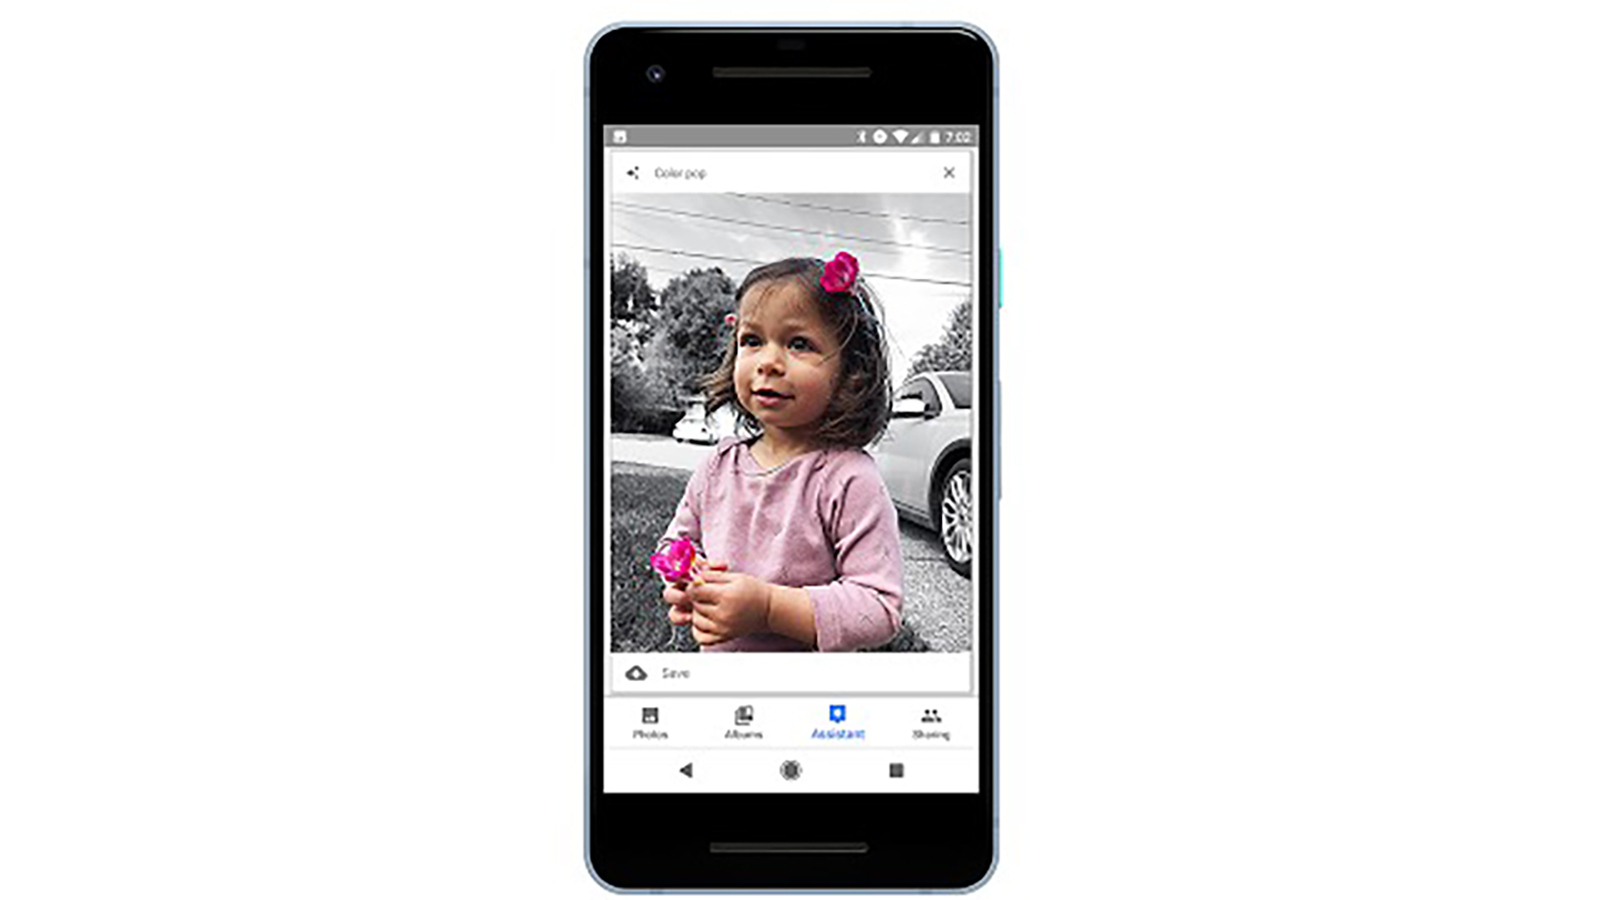 Google_Photos update